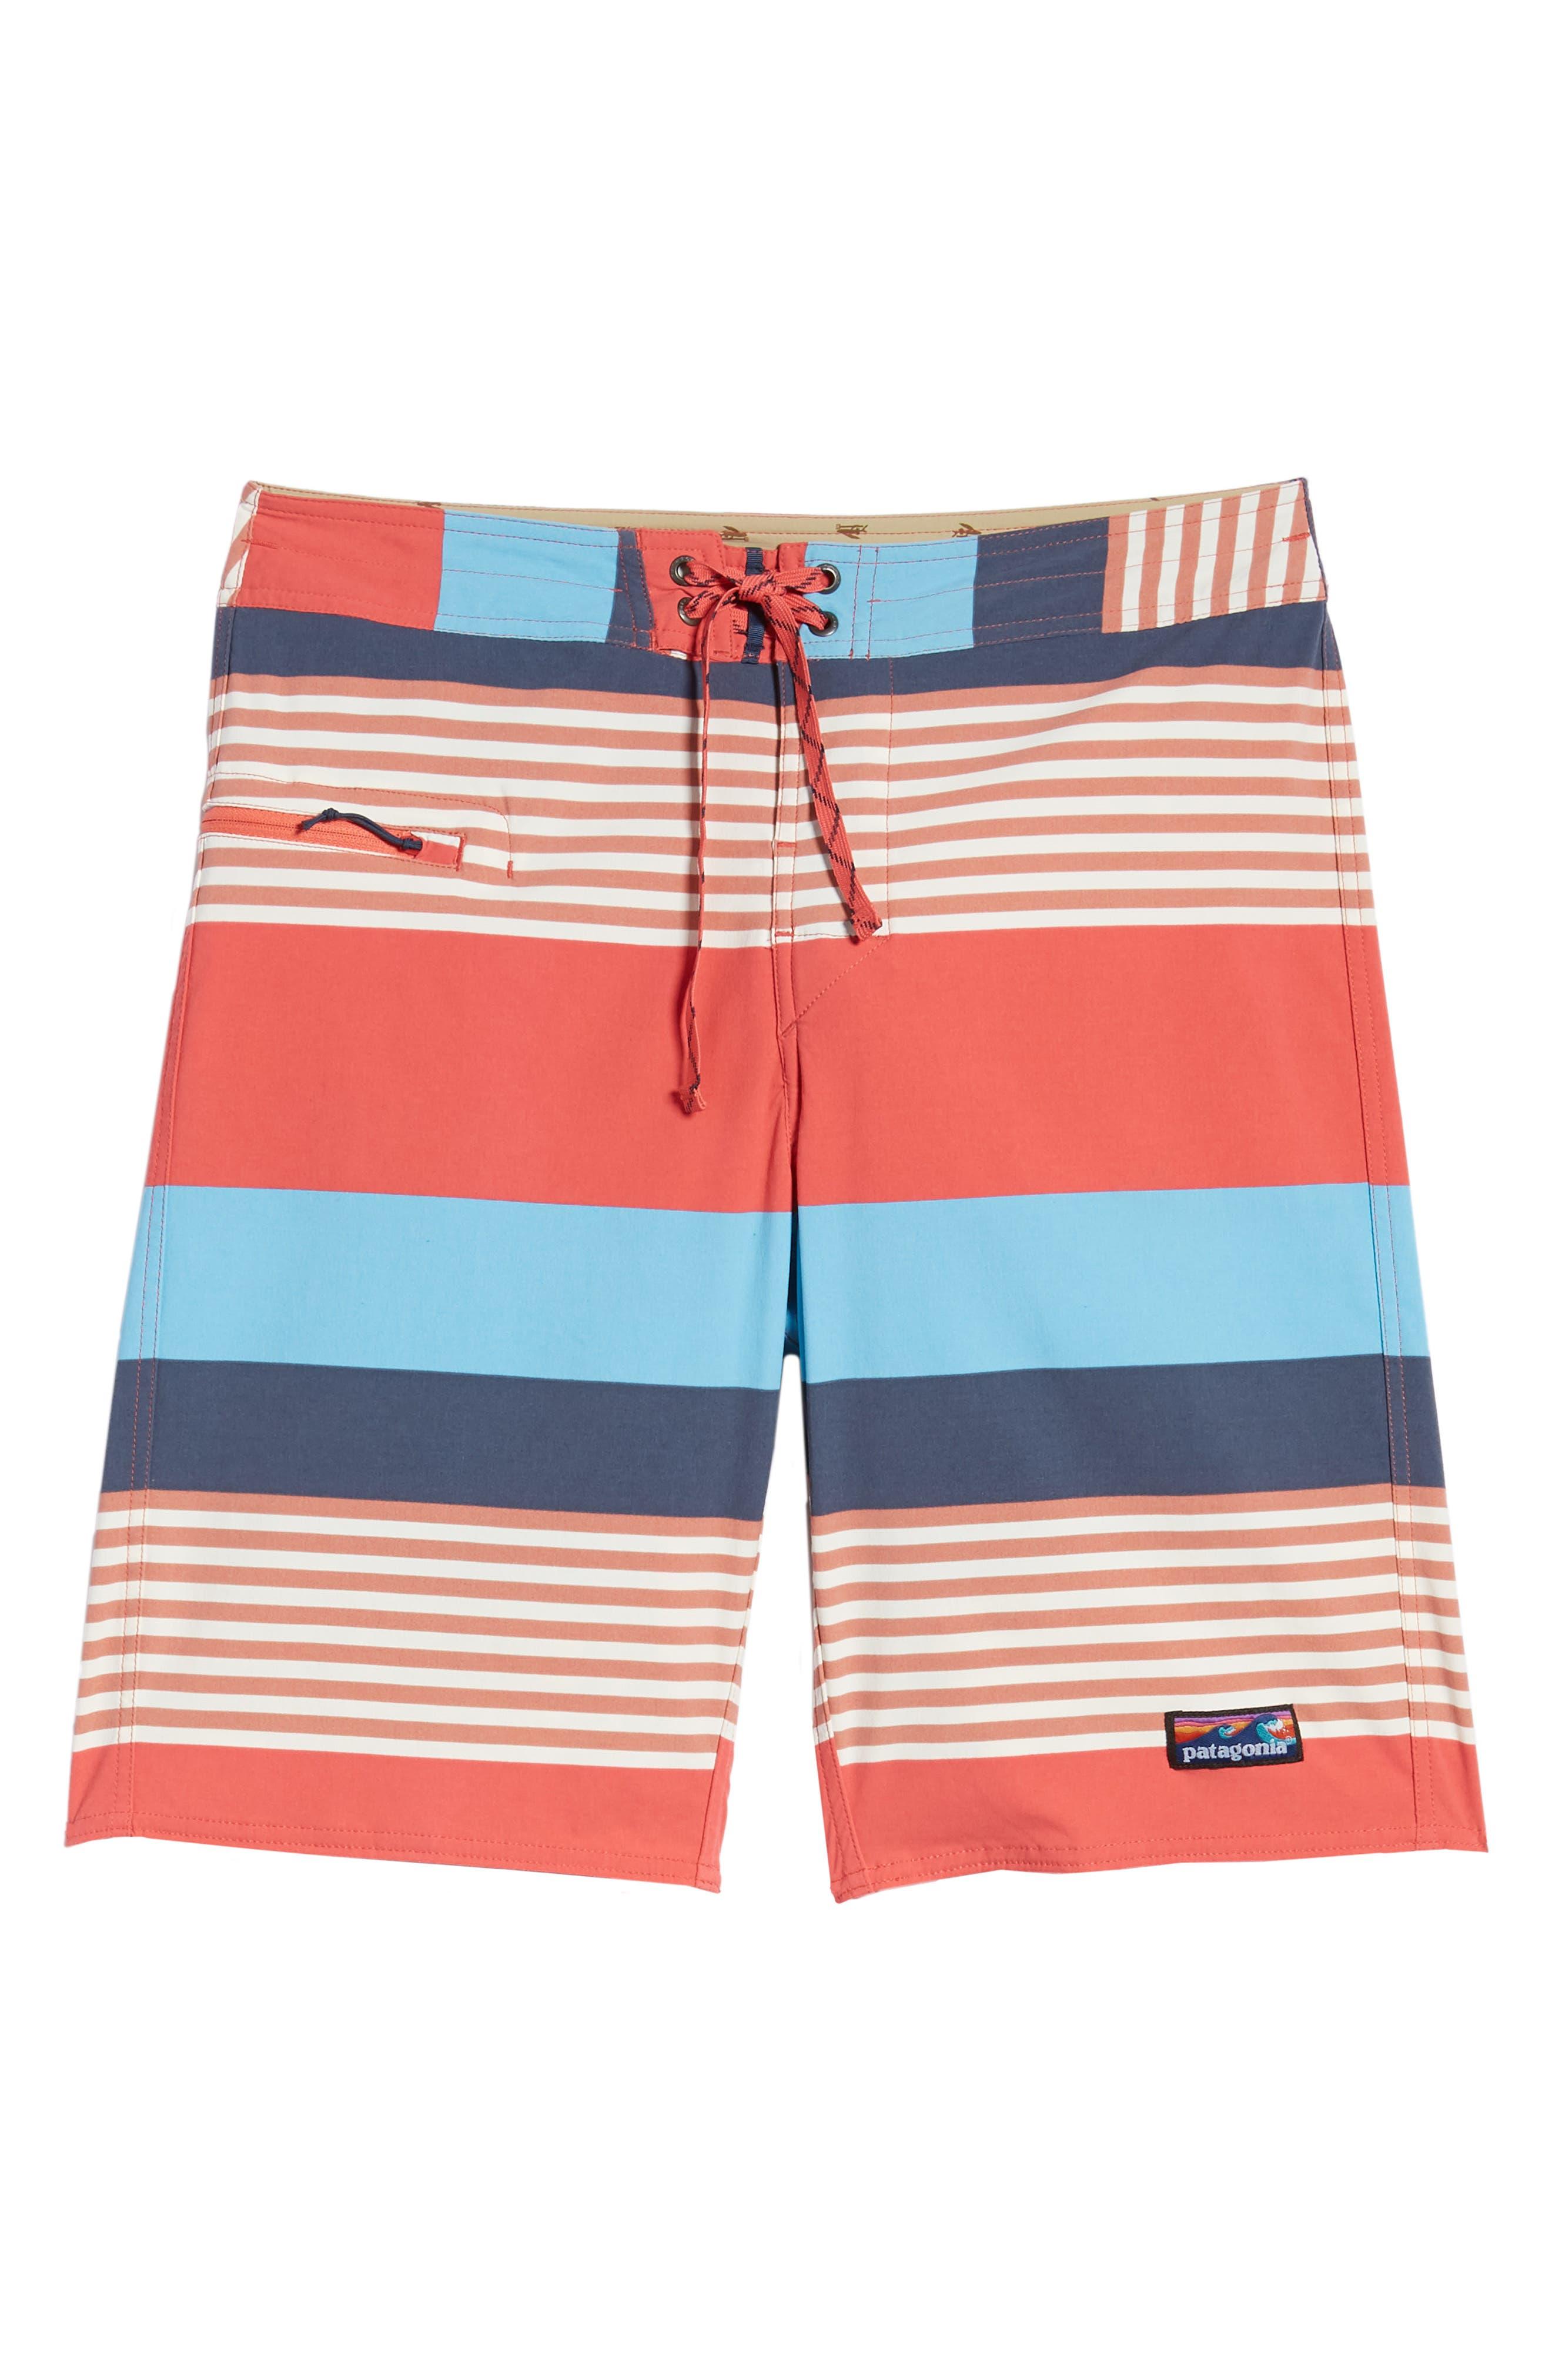 PATAGONIA,                             Wavefarer Board Shorts,                             Alternate thumbnail 6, color,                             FITZ STRIPE: SPICED CORAL